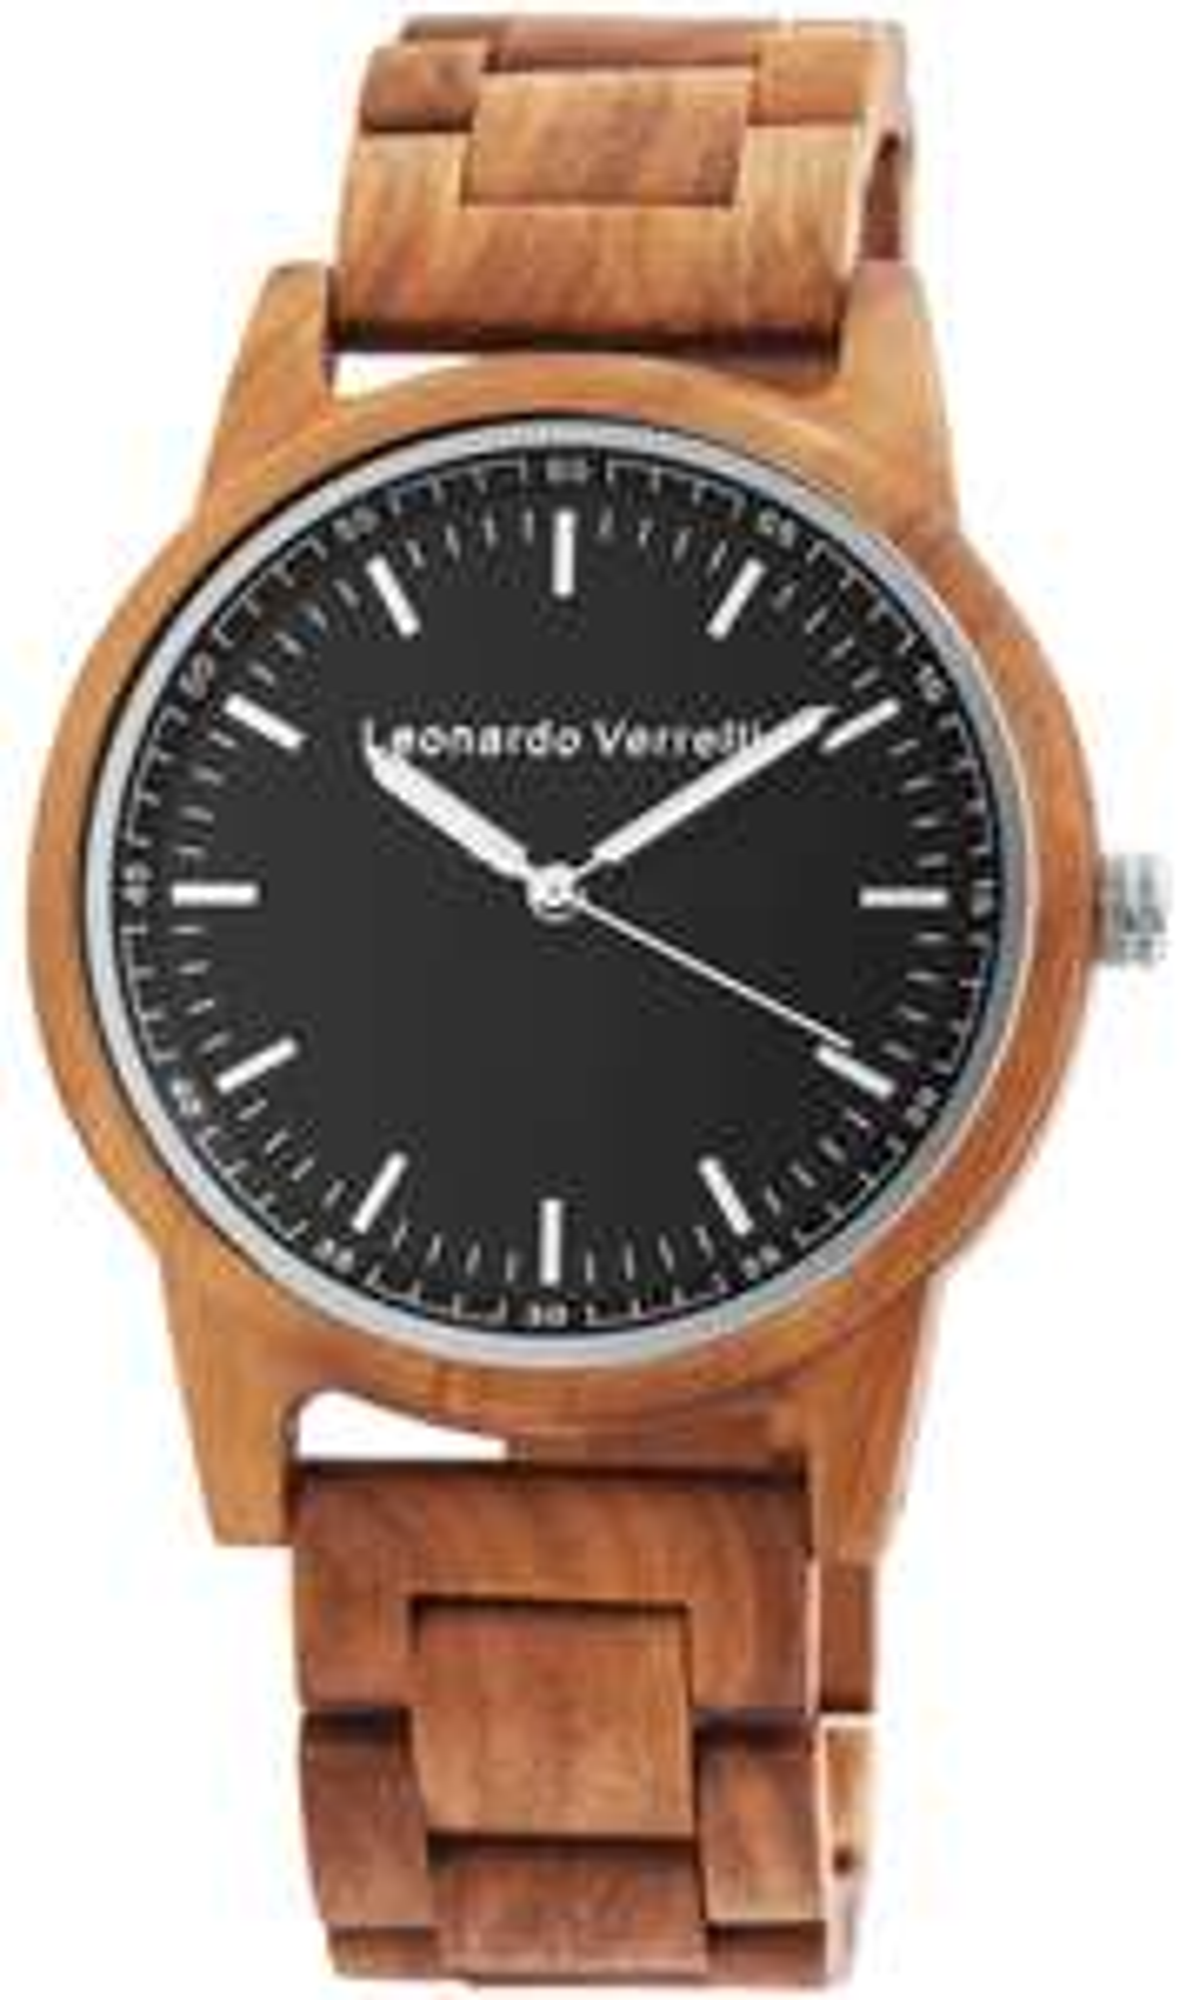 LEONARDO VERRELI Uhren bei brands4friends ca. 20-30% unter Idealo